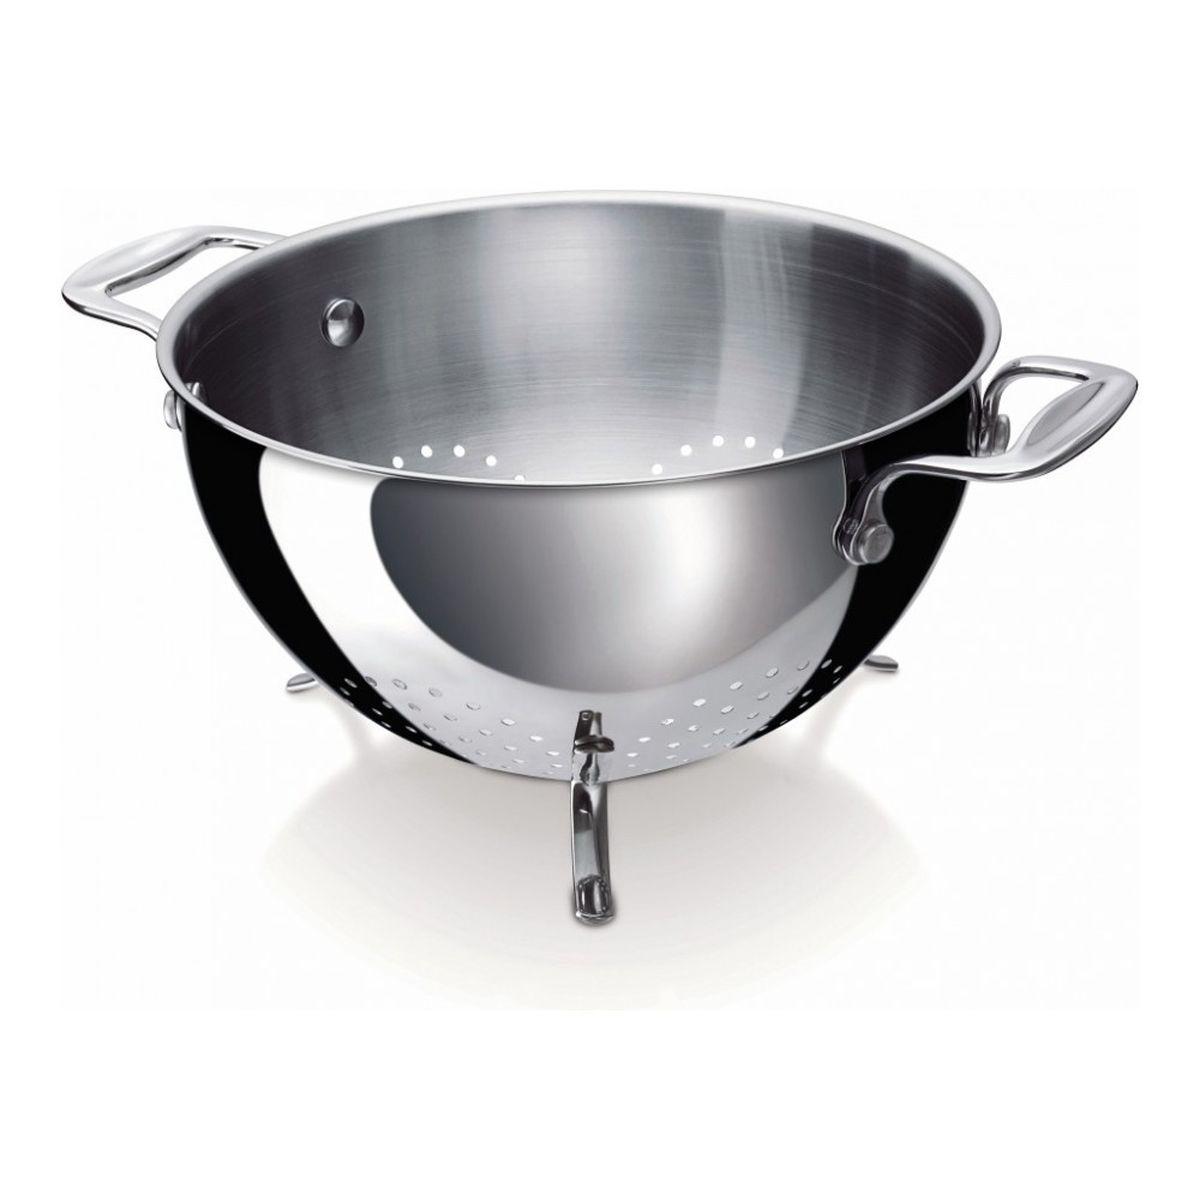 Дуршлаг Beka Chef, диаметр 22 см12060224Дуршлаг Chef 22см